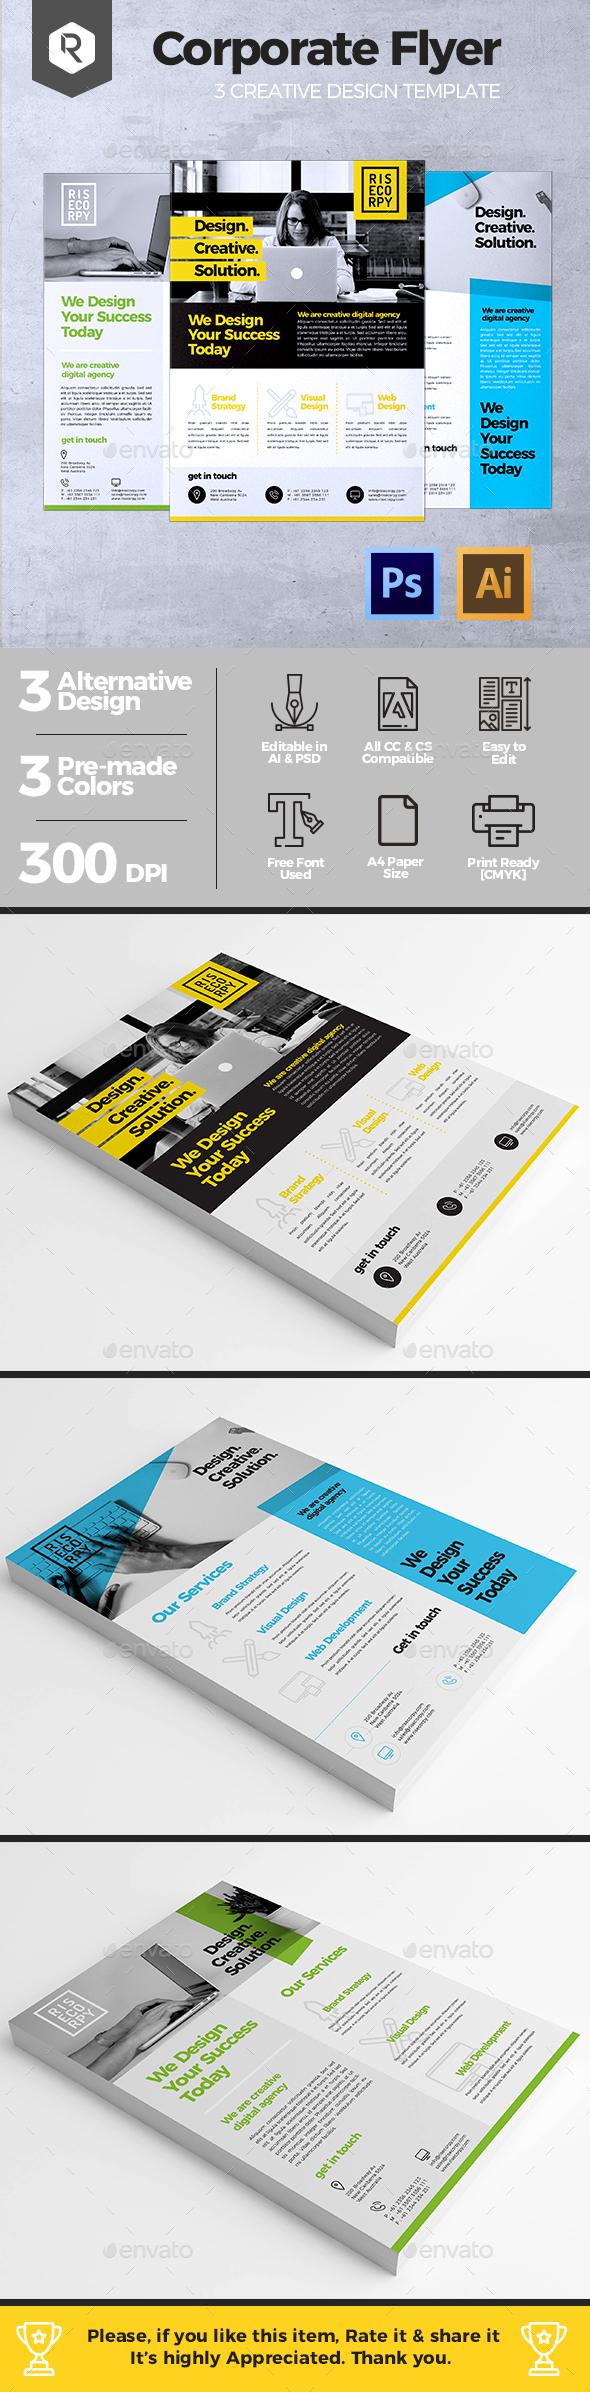 Creative Corporate Flyer Vol. 01 - Corporate Flyers